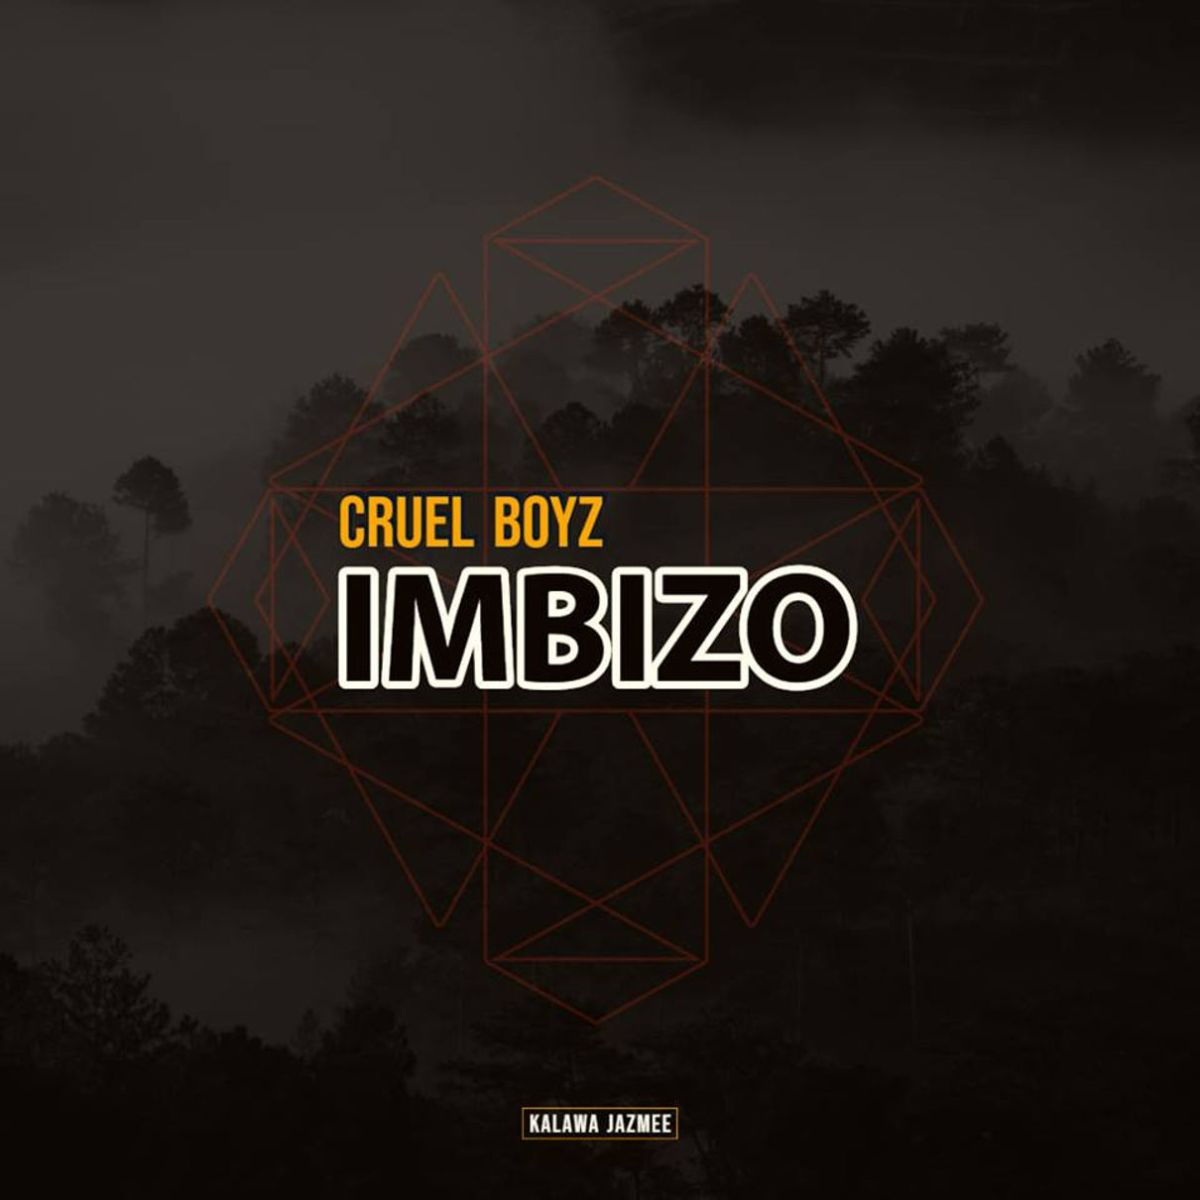 Cruel Boyz - Imbizo